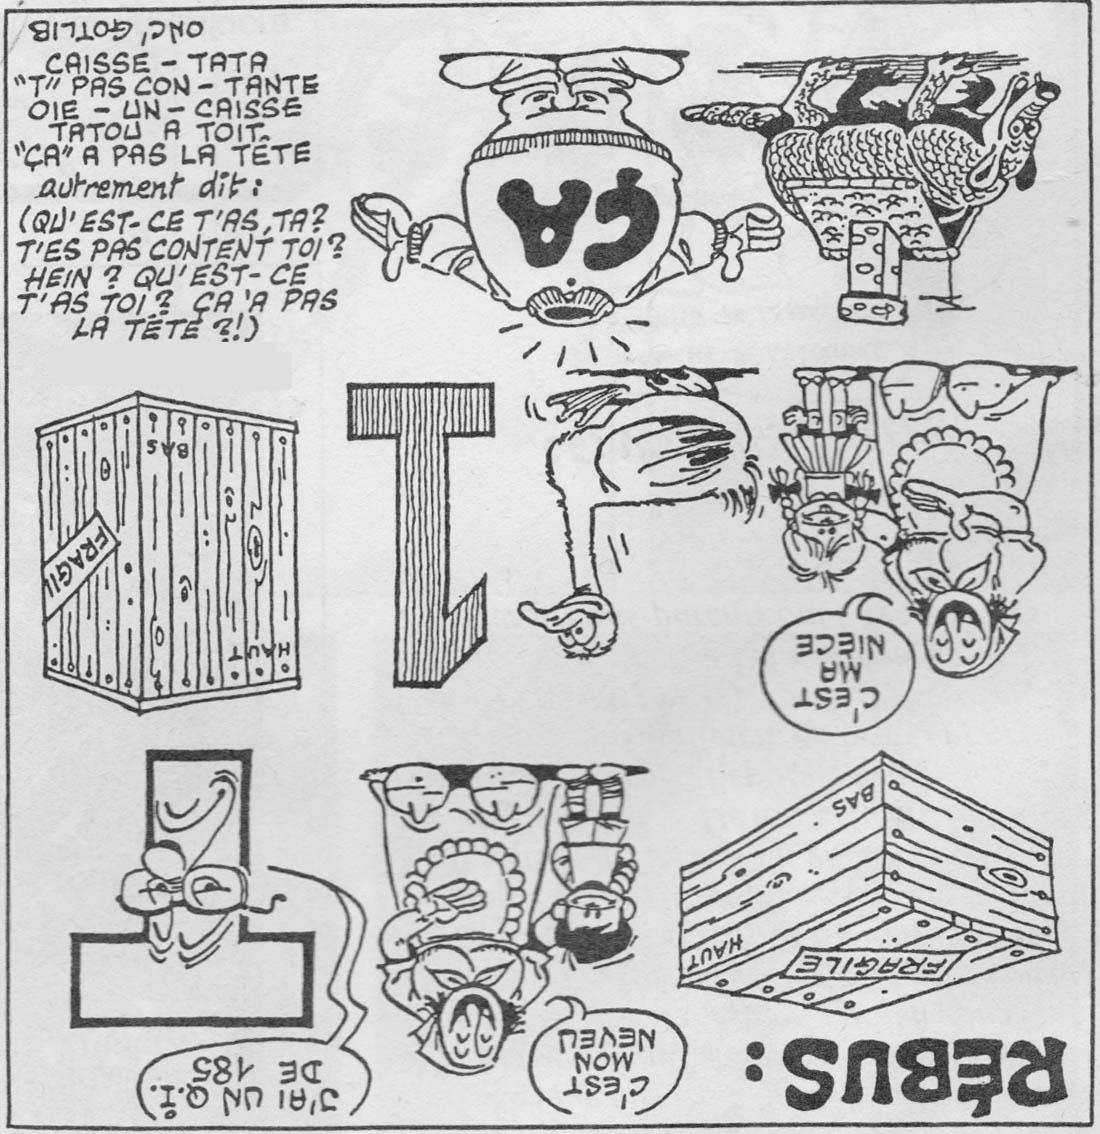 http://www.prise2tete.fr/upload/nobodydy-rebusreponse.jpg